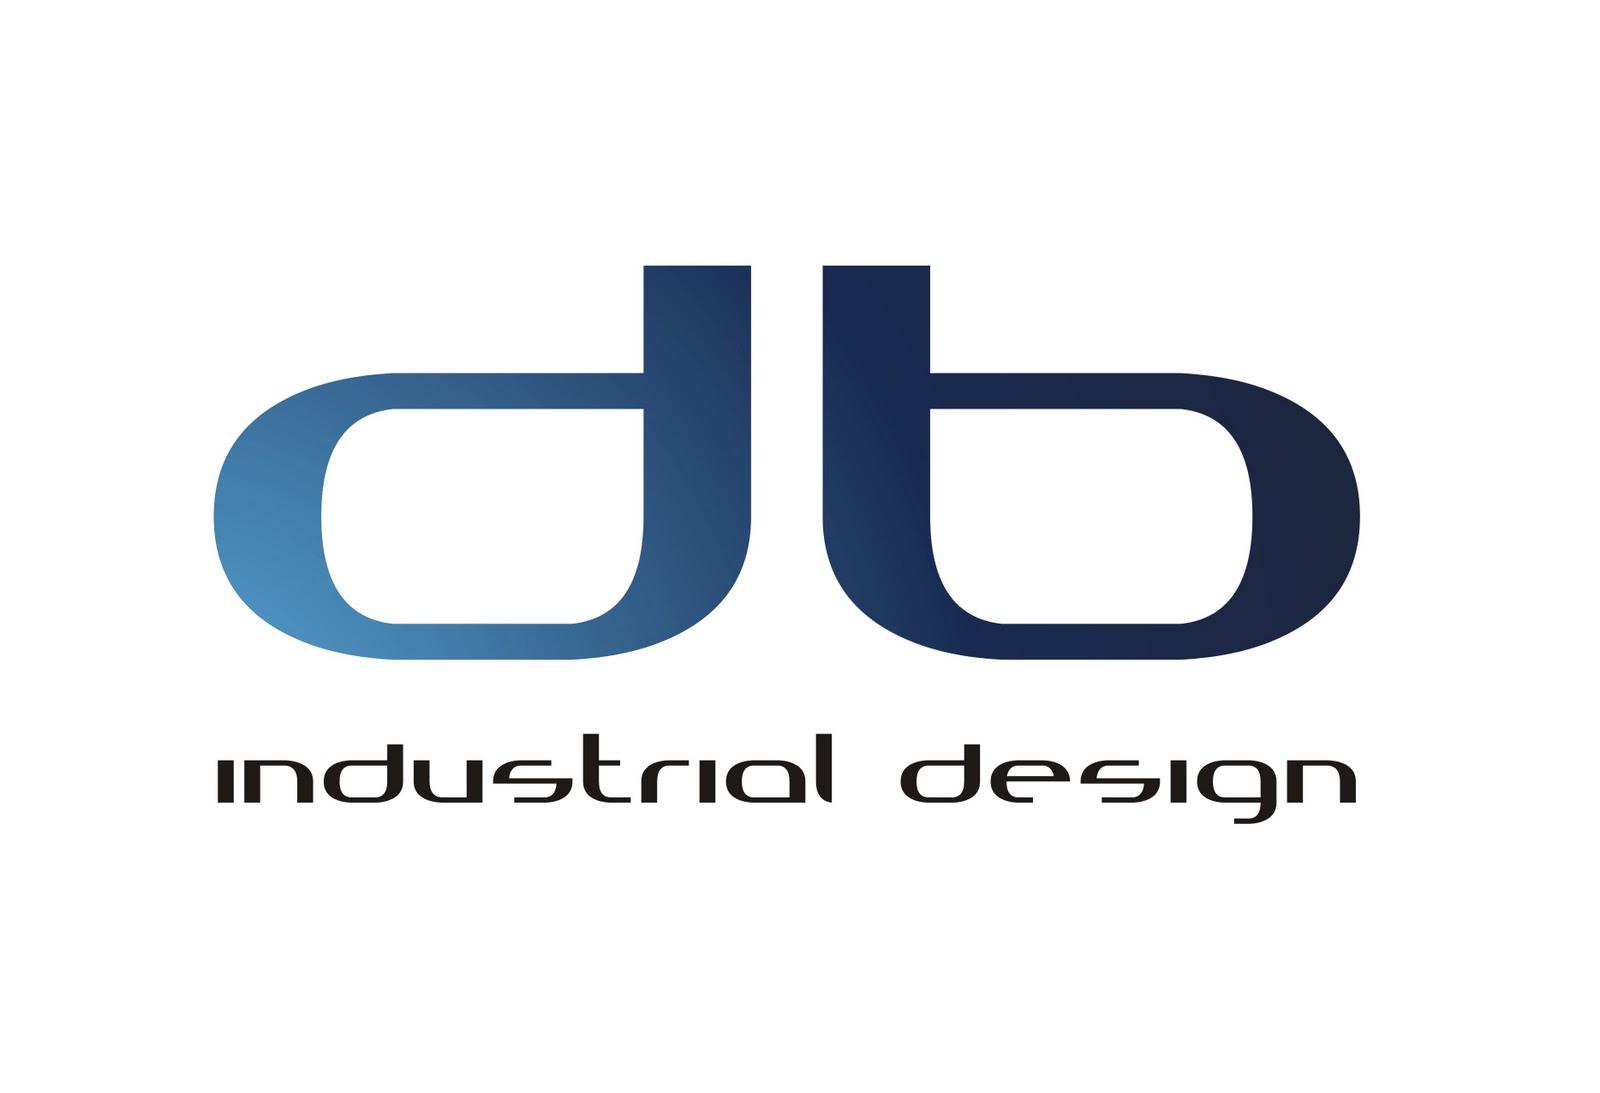 Db agora é design industrial